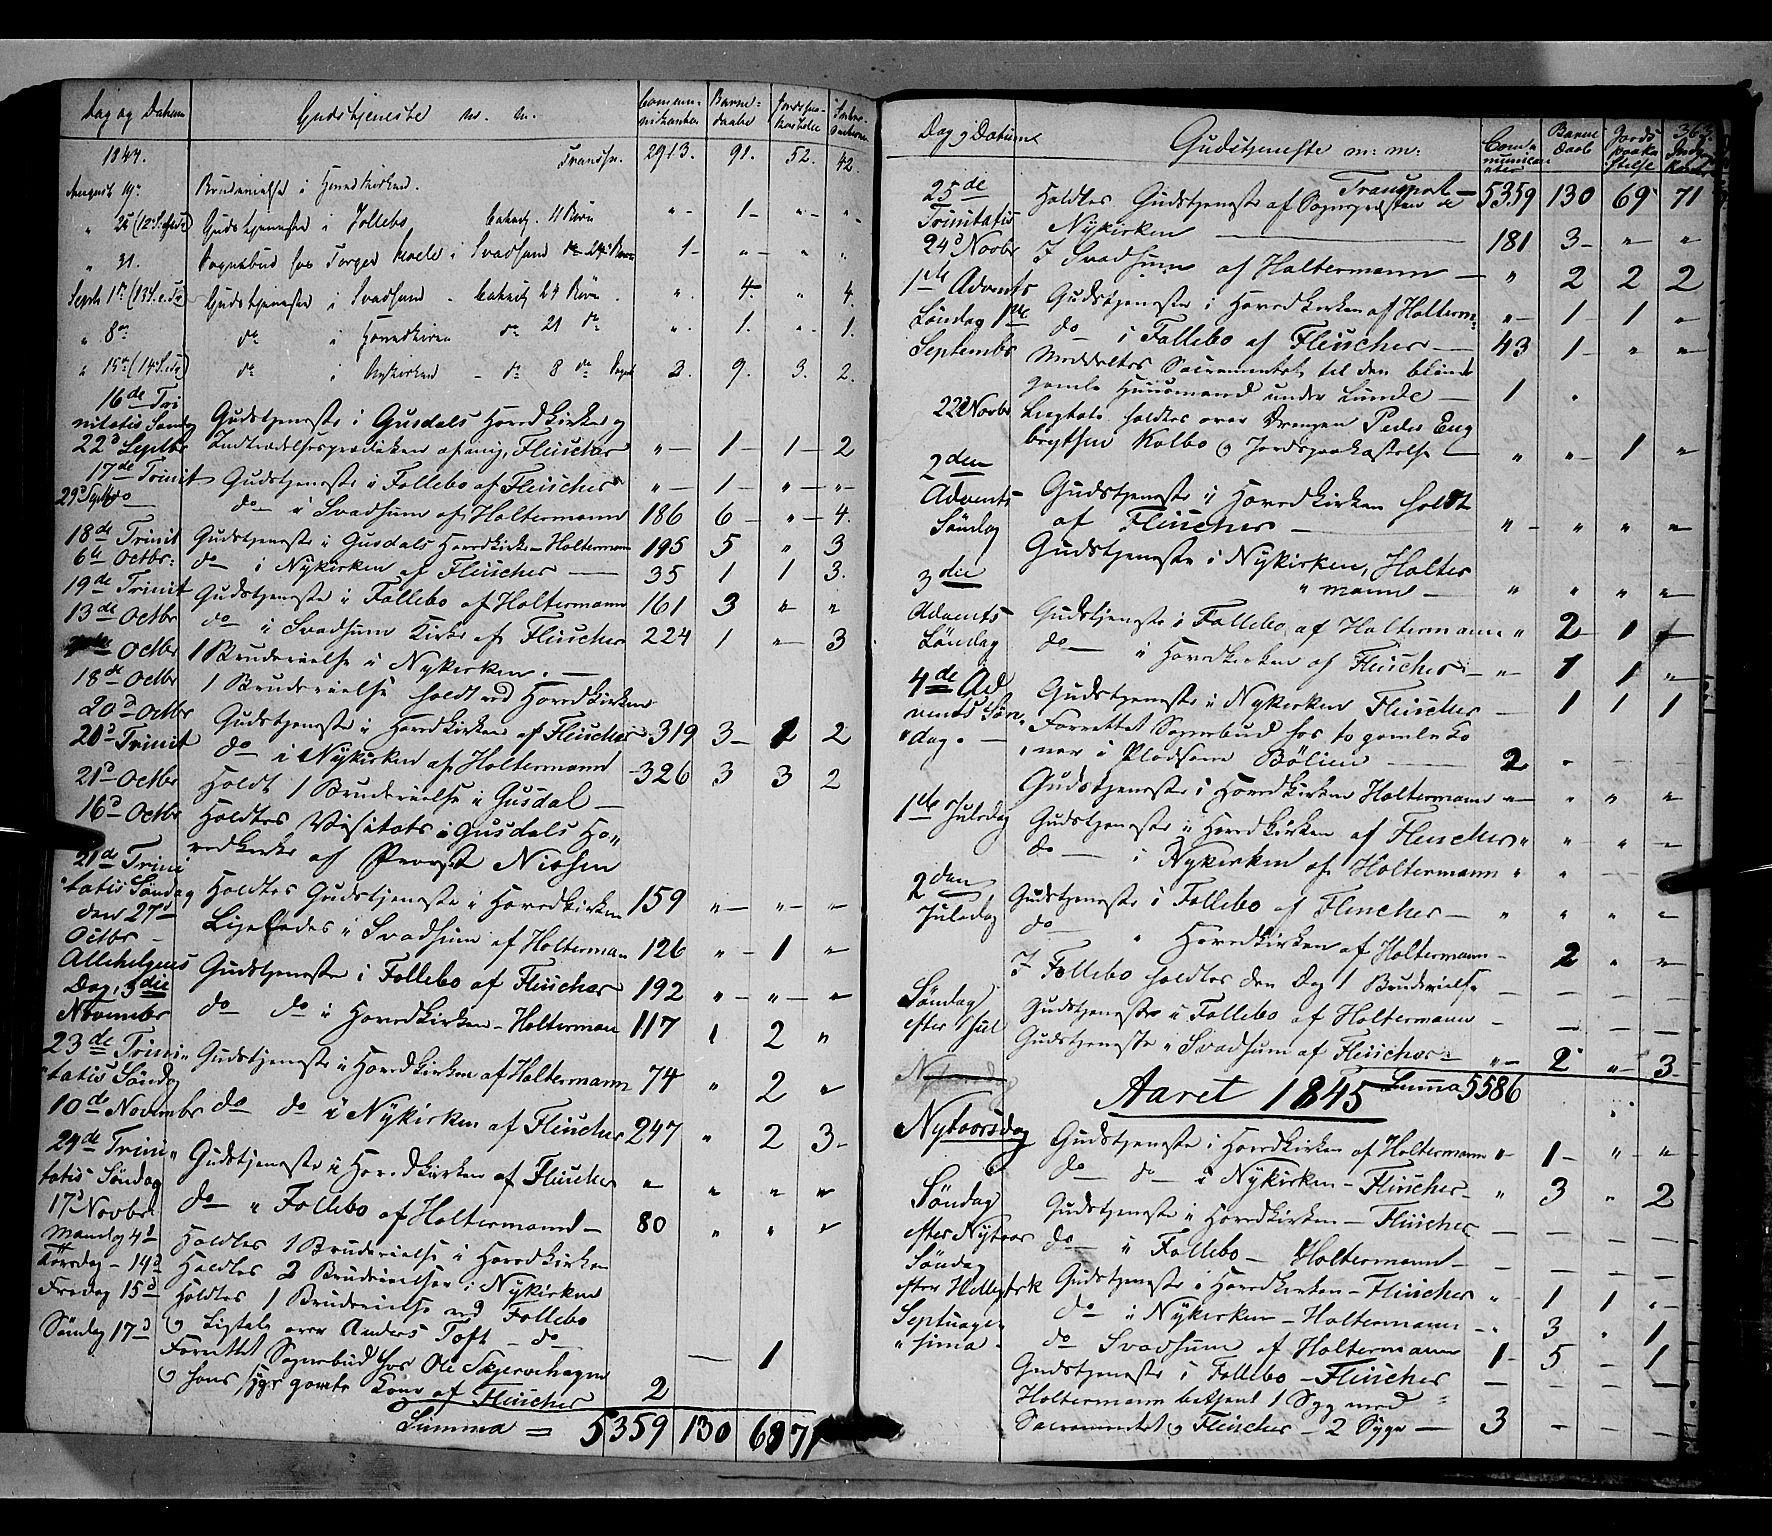 SAH, Gausdal prestekontor, Ministerialbok nr. 7, 1840-1850, s. 363